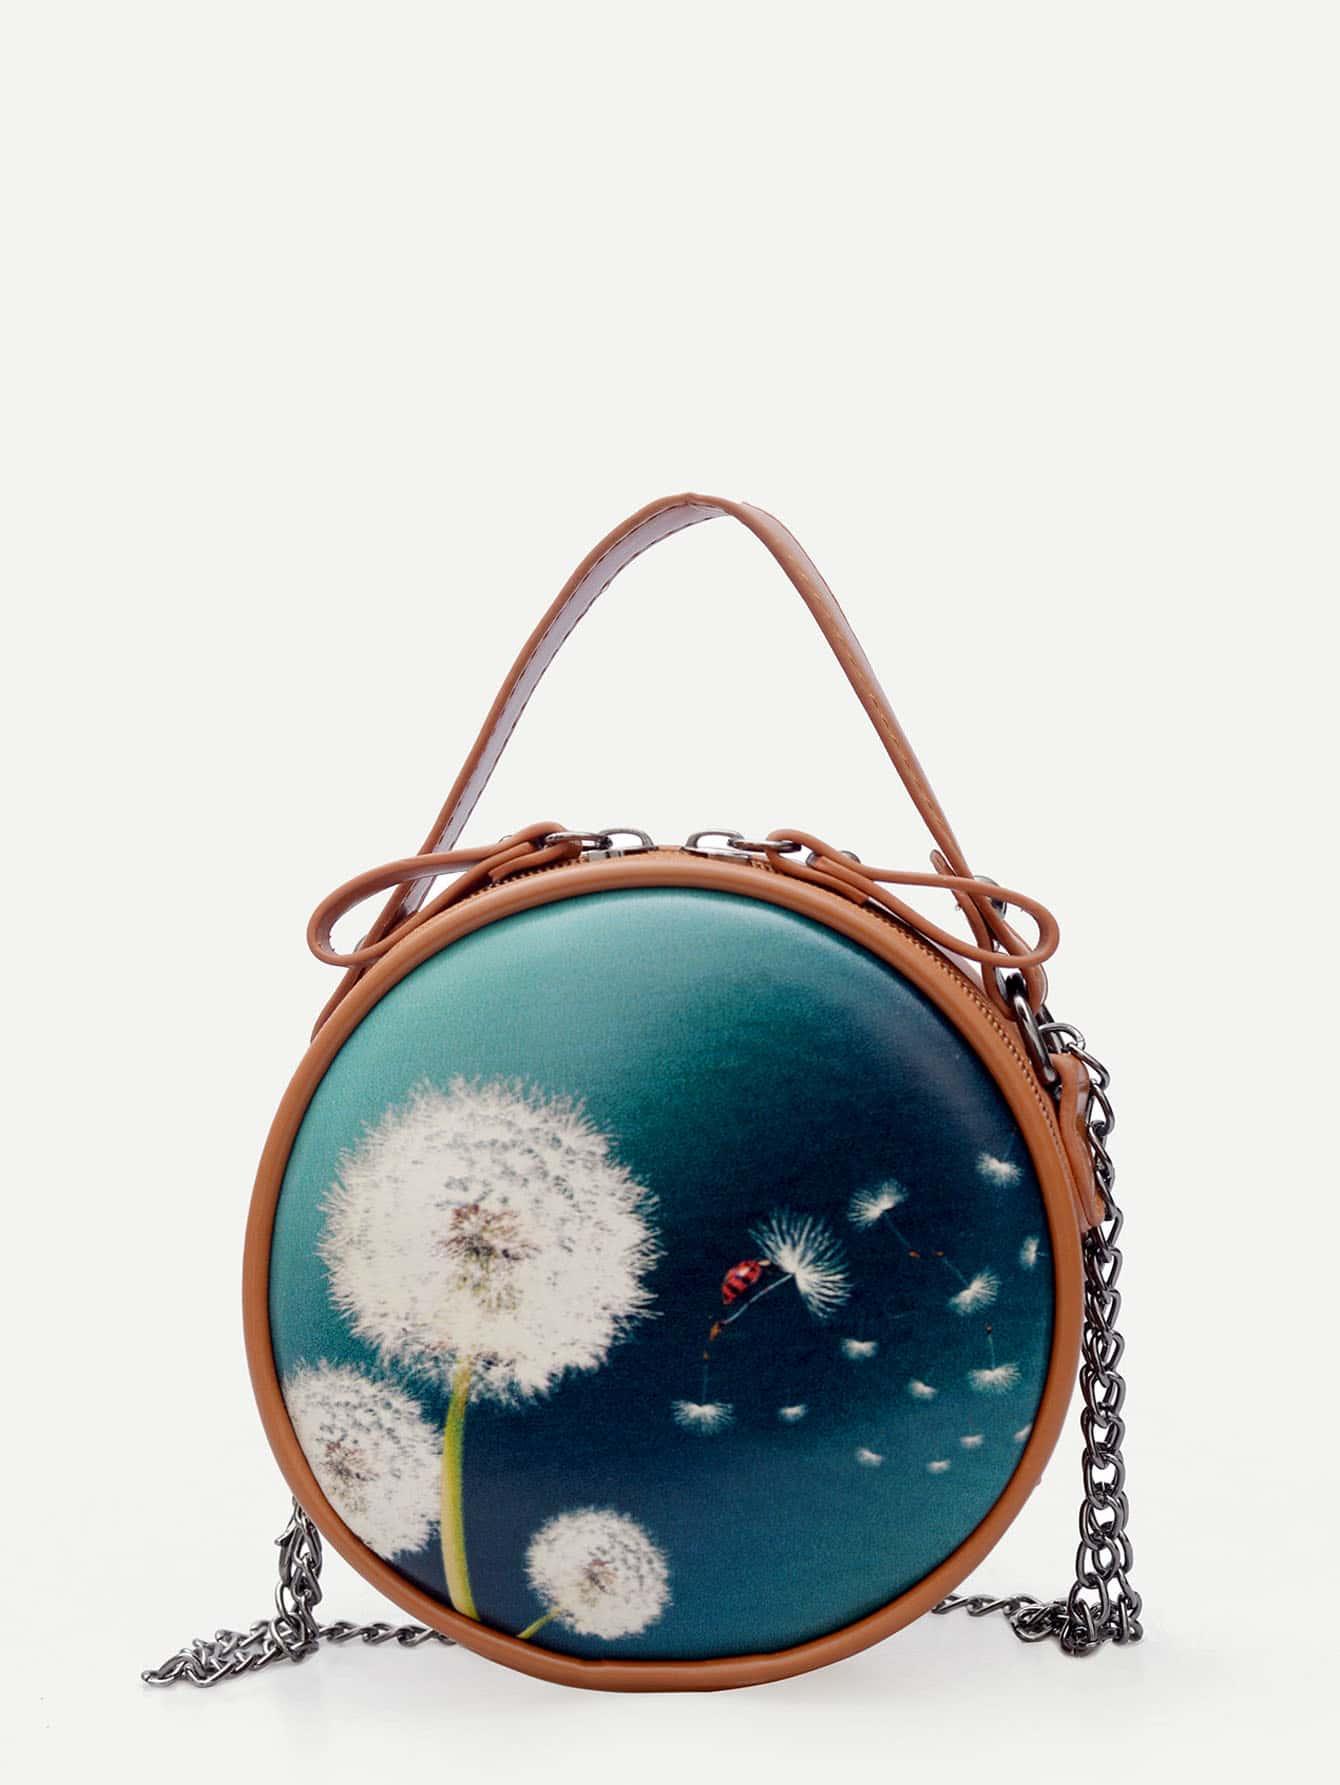 Dandelion Print Zip Around Chain Bag